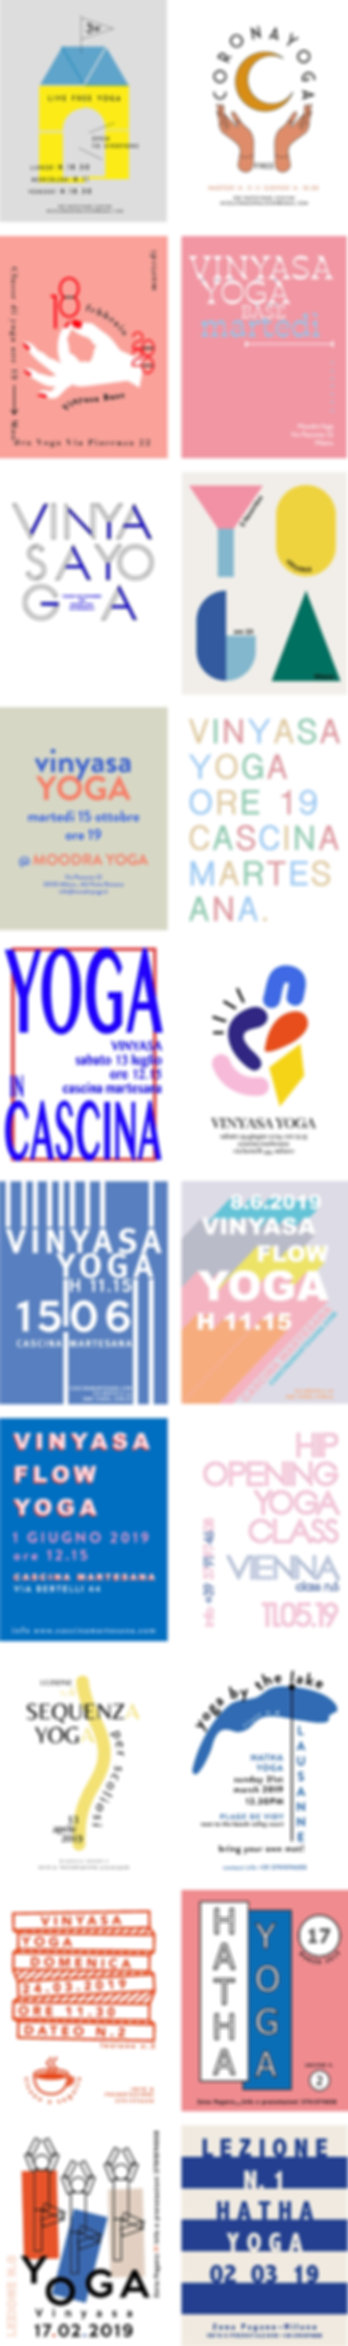 yoga flyer web-01.jpg